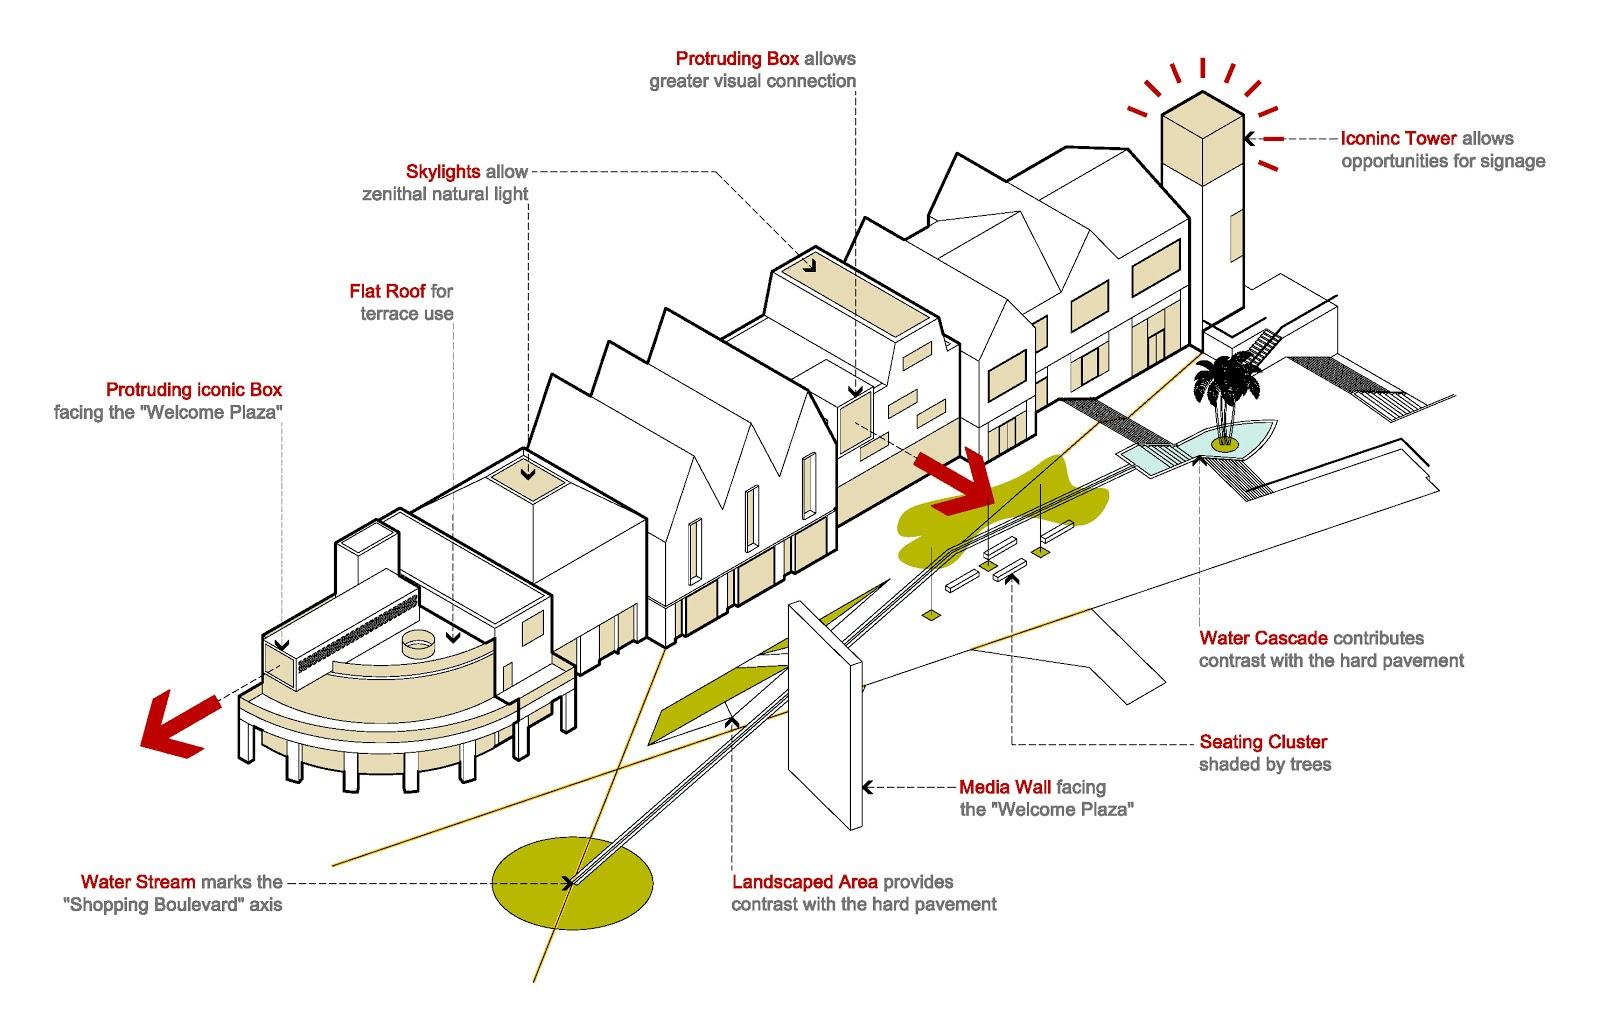 Pedro dias rchitect for Architectural concept definition